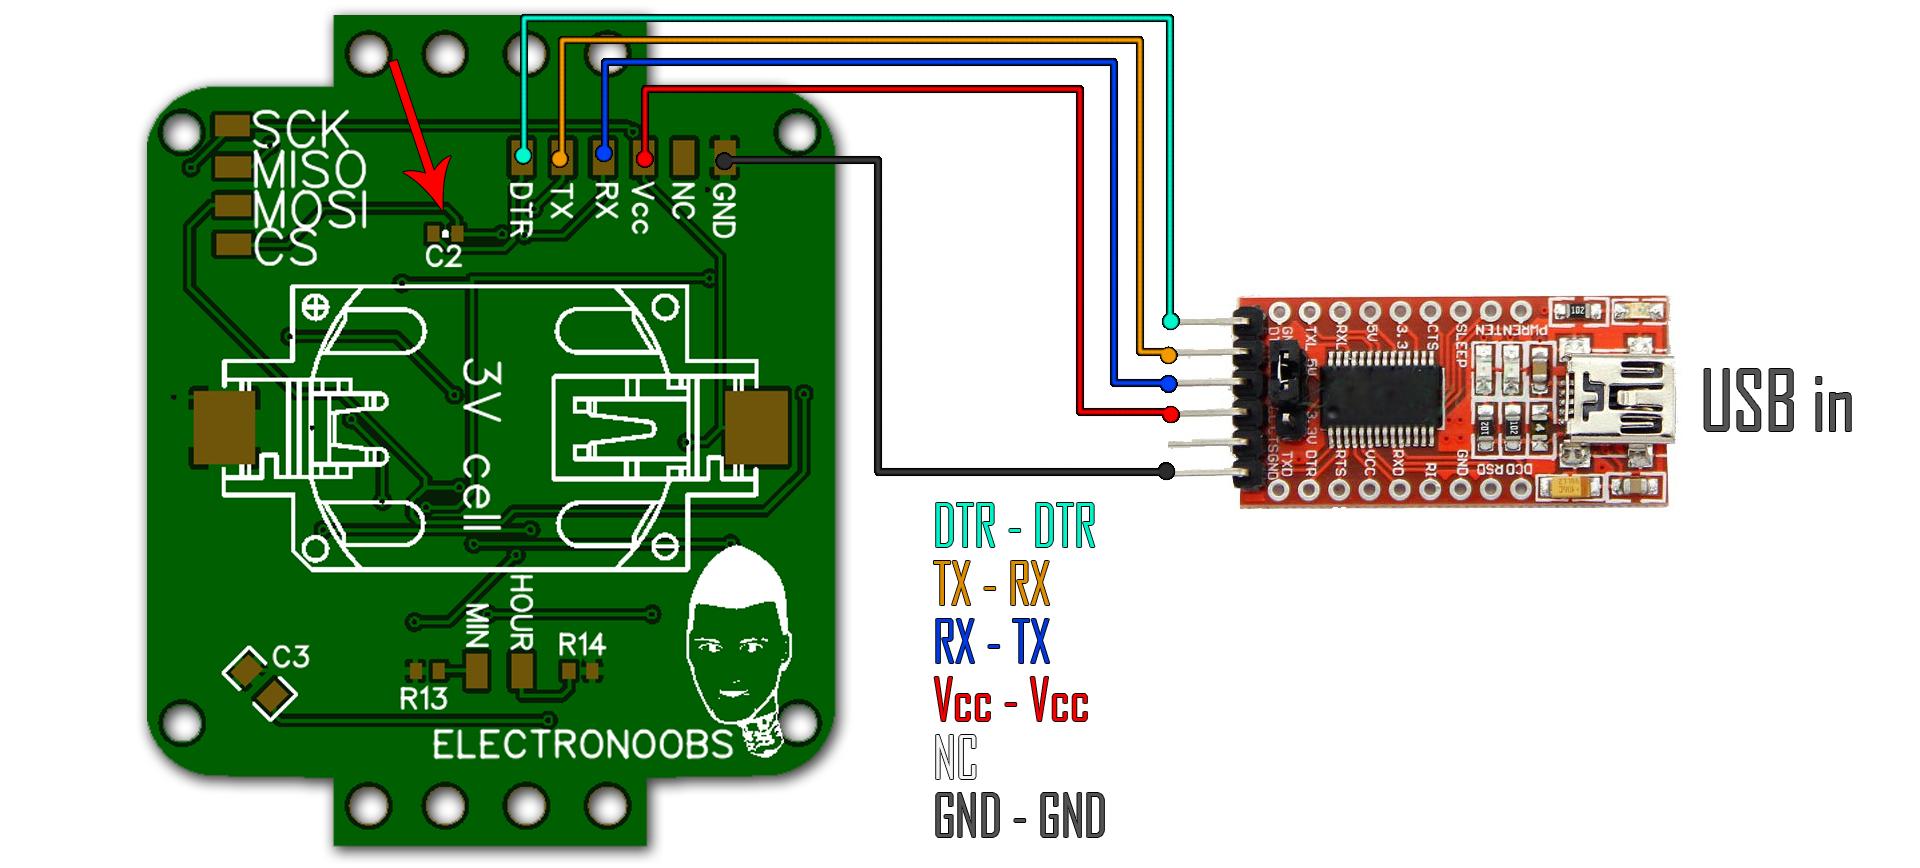 ATmega328p-AU bootloader 8MHz internal clock